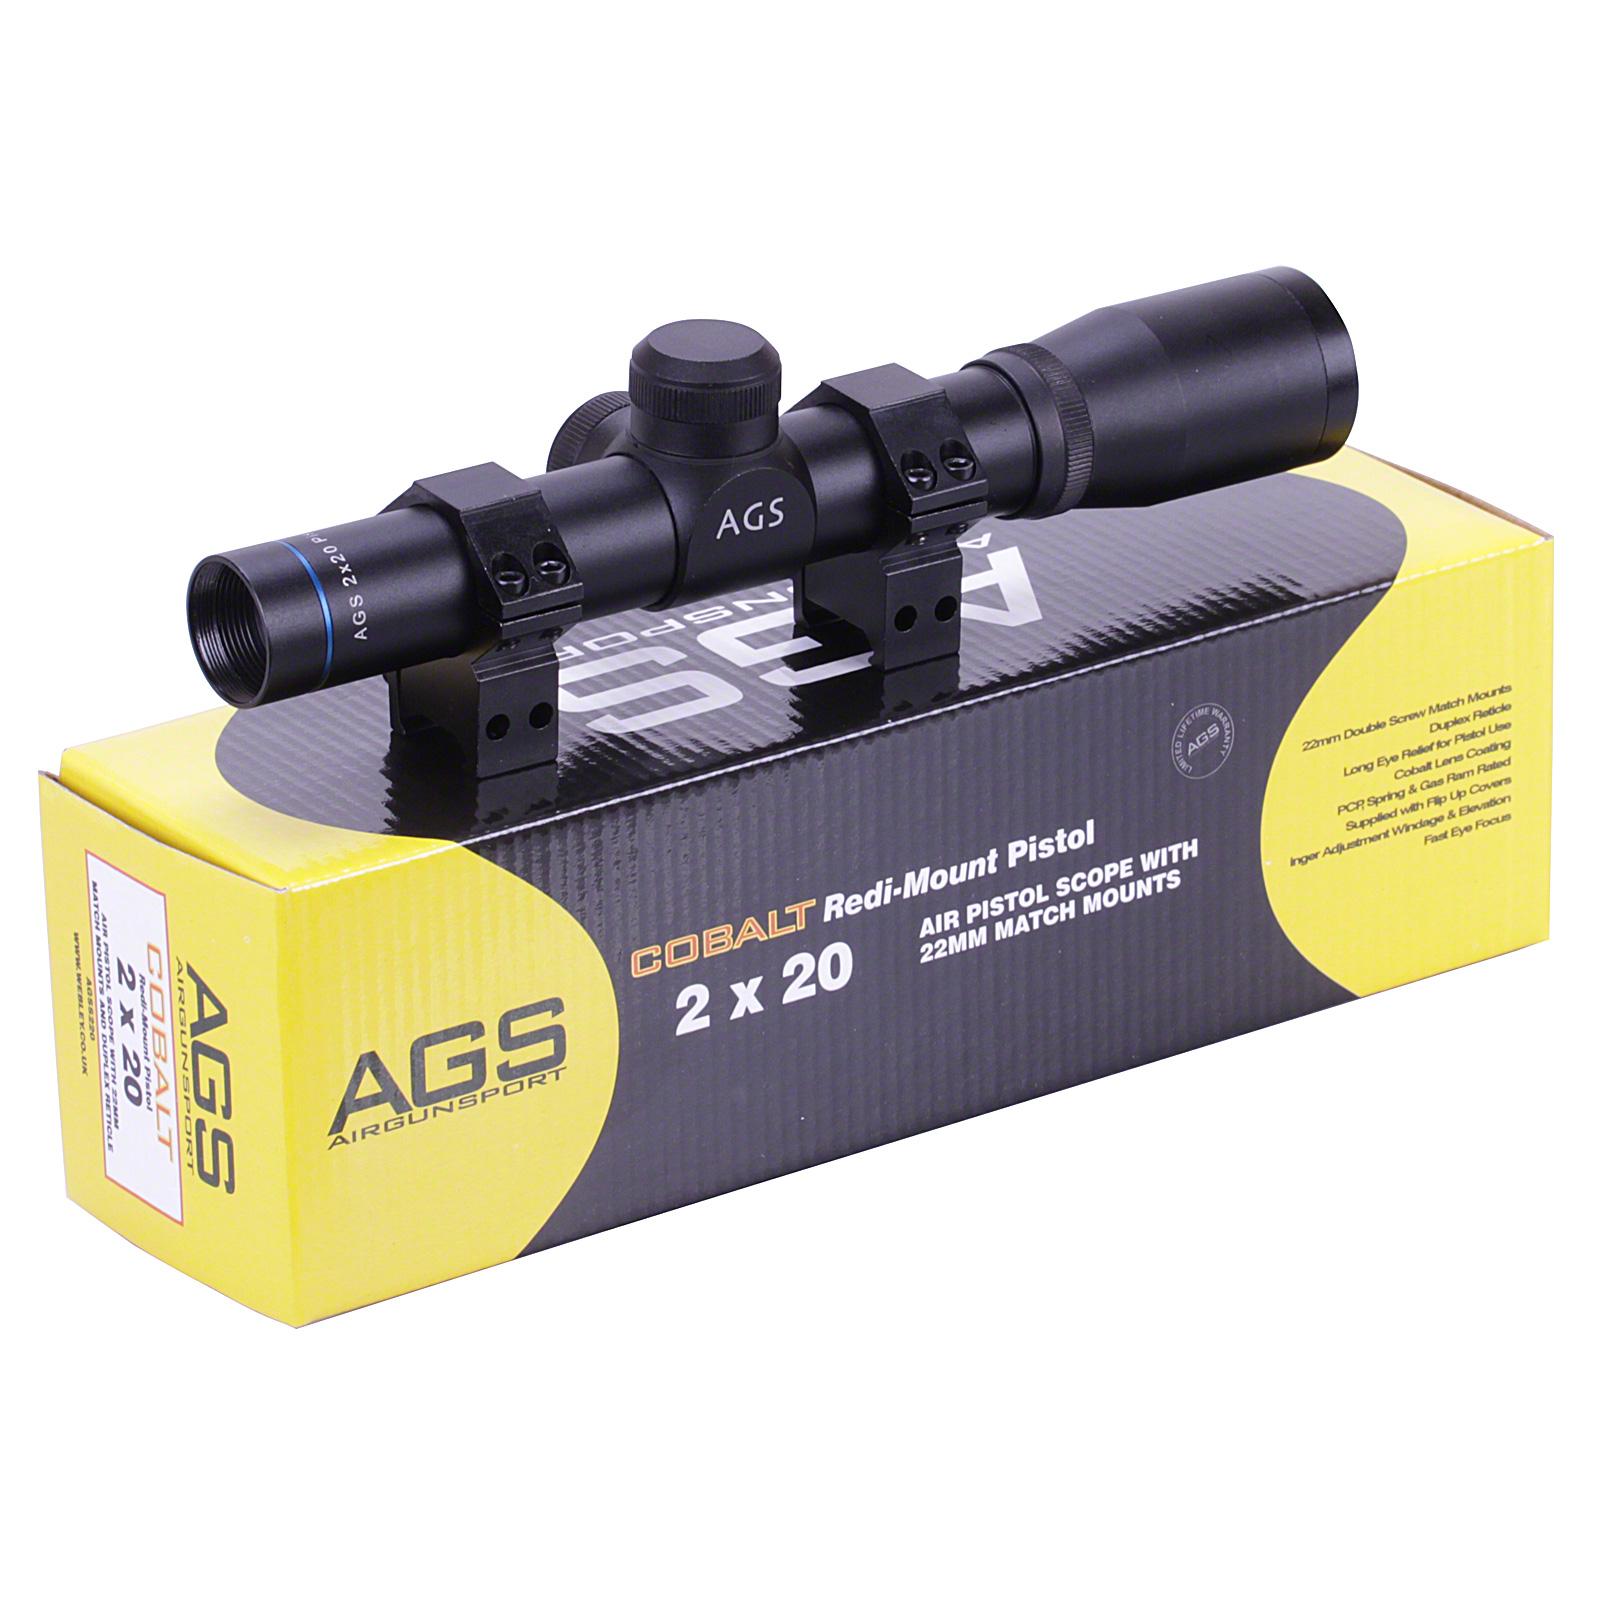 Details about AGS Cobalt 2x20 PISTOL Gun Scope Telescopic Sight + MOUNTS  Webley Alecto